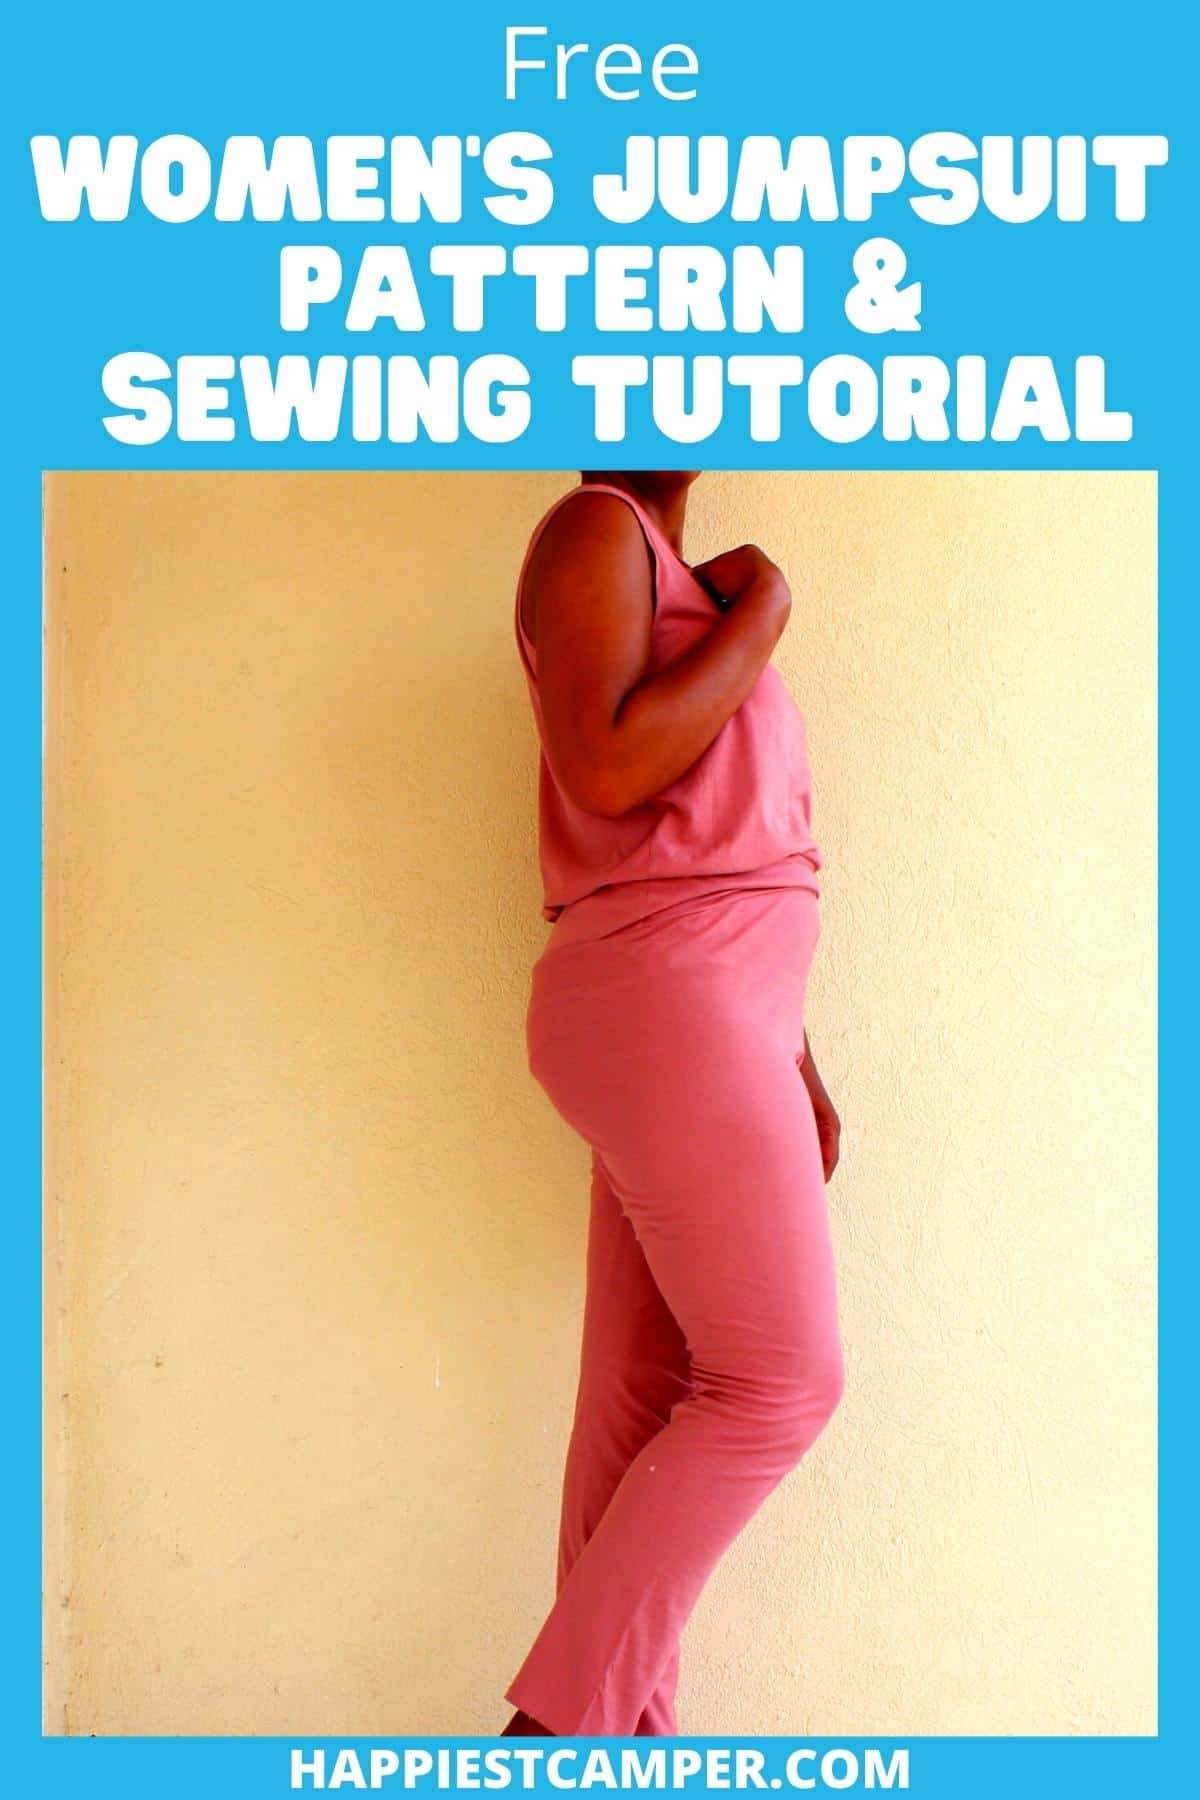 Free Women's Jumpsuit Pattern & Sewing Tutorial